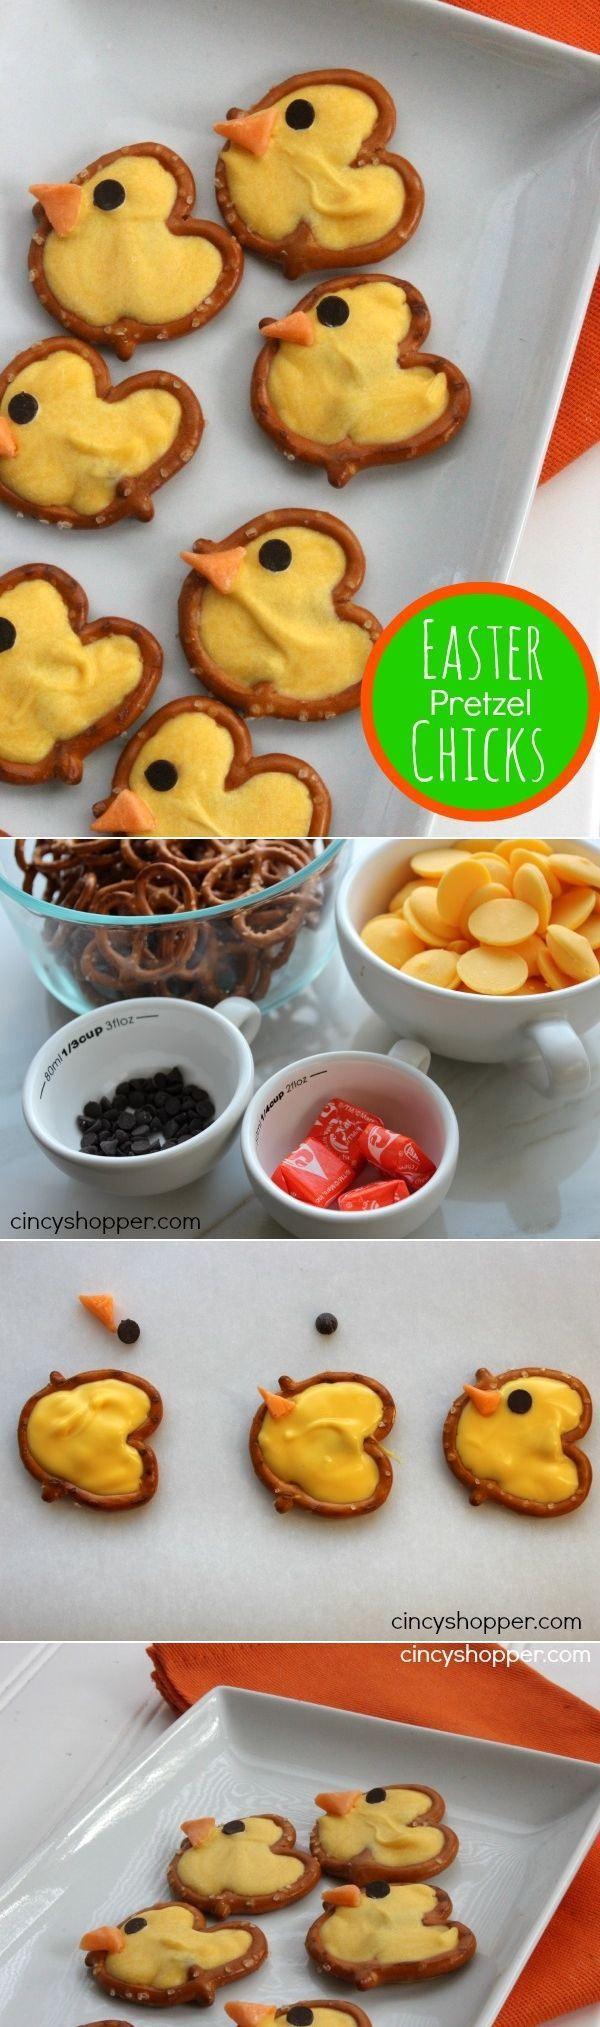 68 best 196 holiday recipes images on pinterest food desserts easter pretzel chick treats negle Images